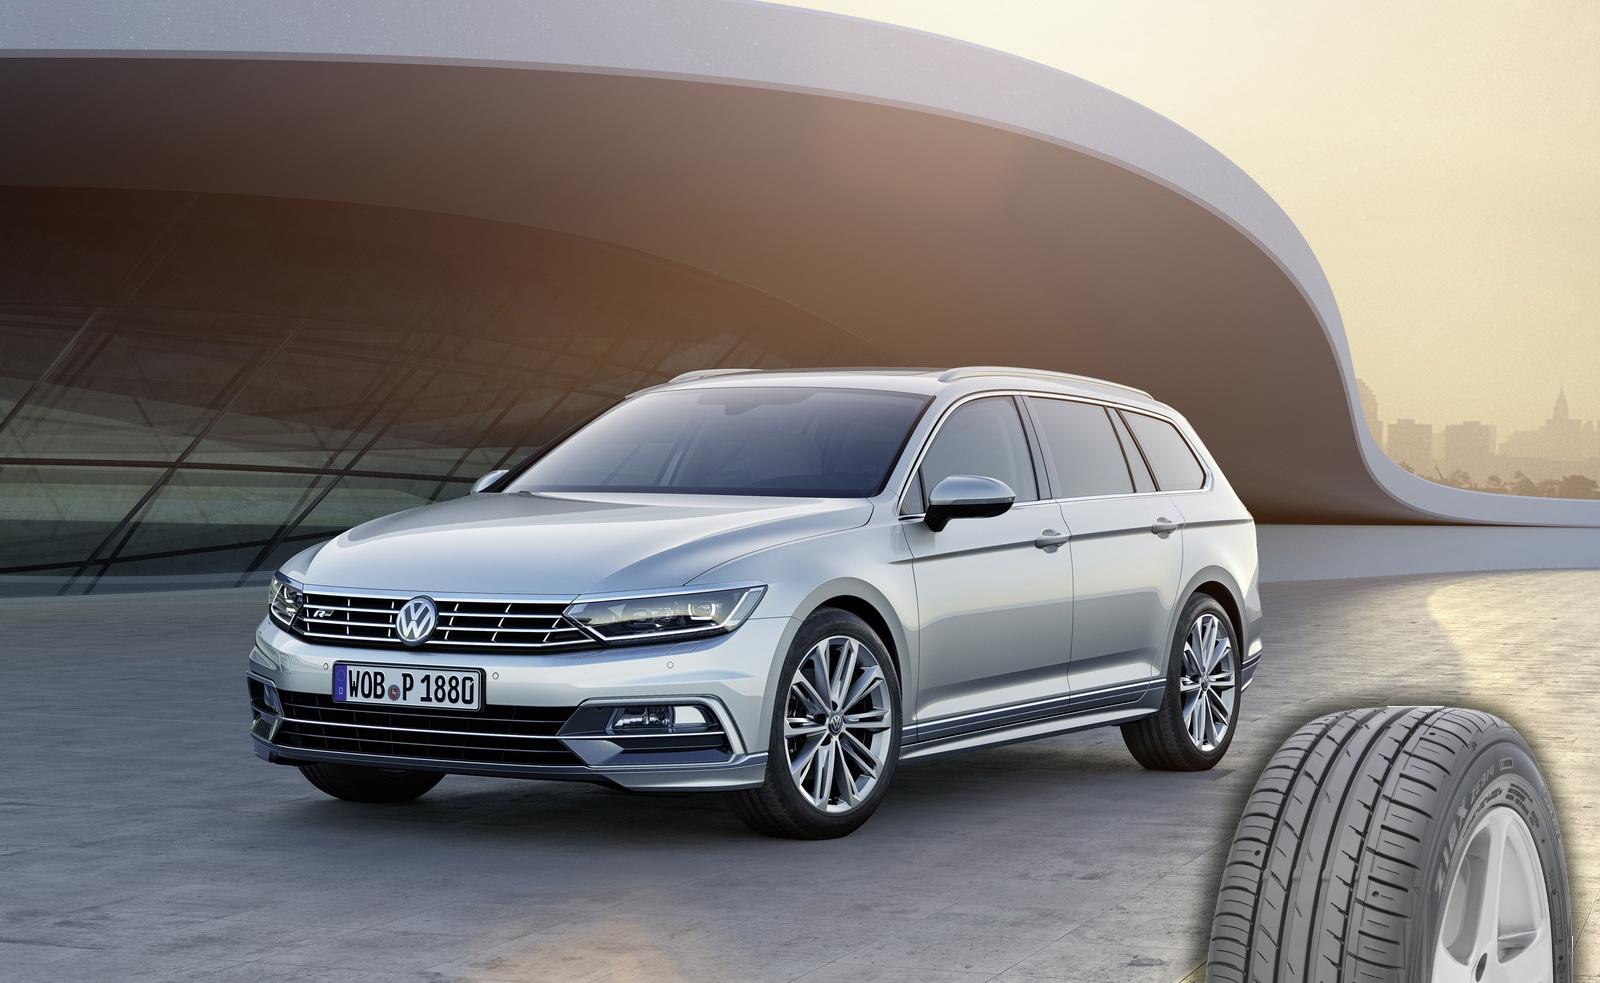 Volkswagen Passat komplekteeritakse Falken rehvidega